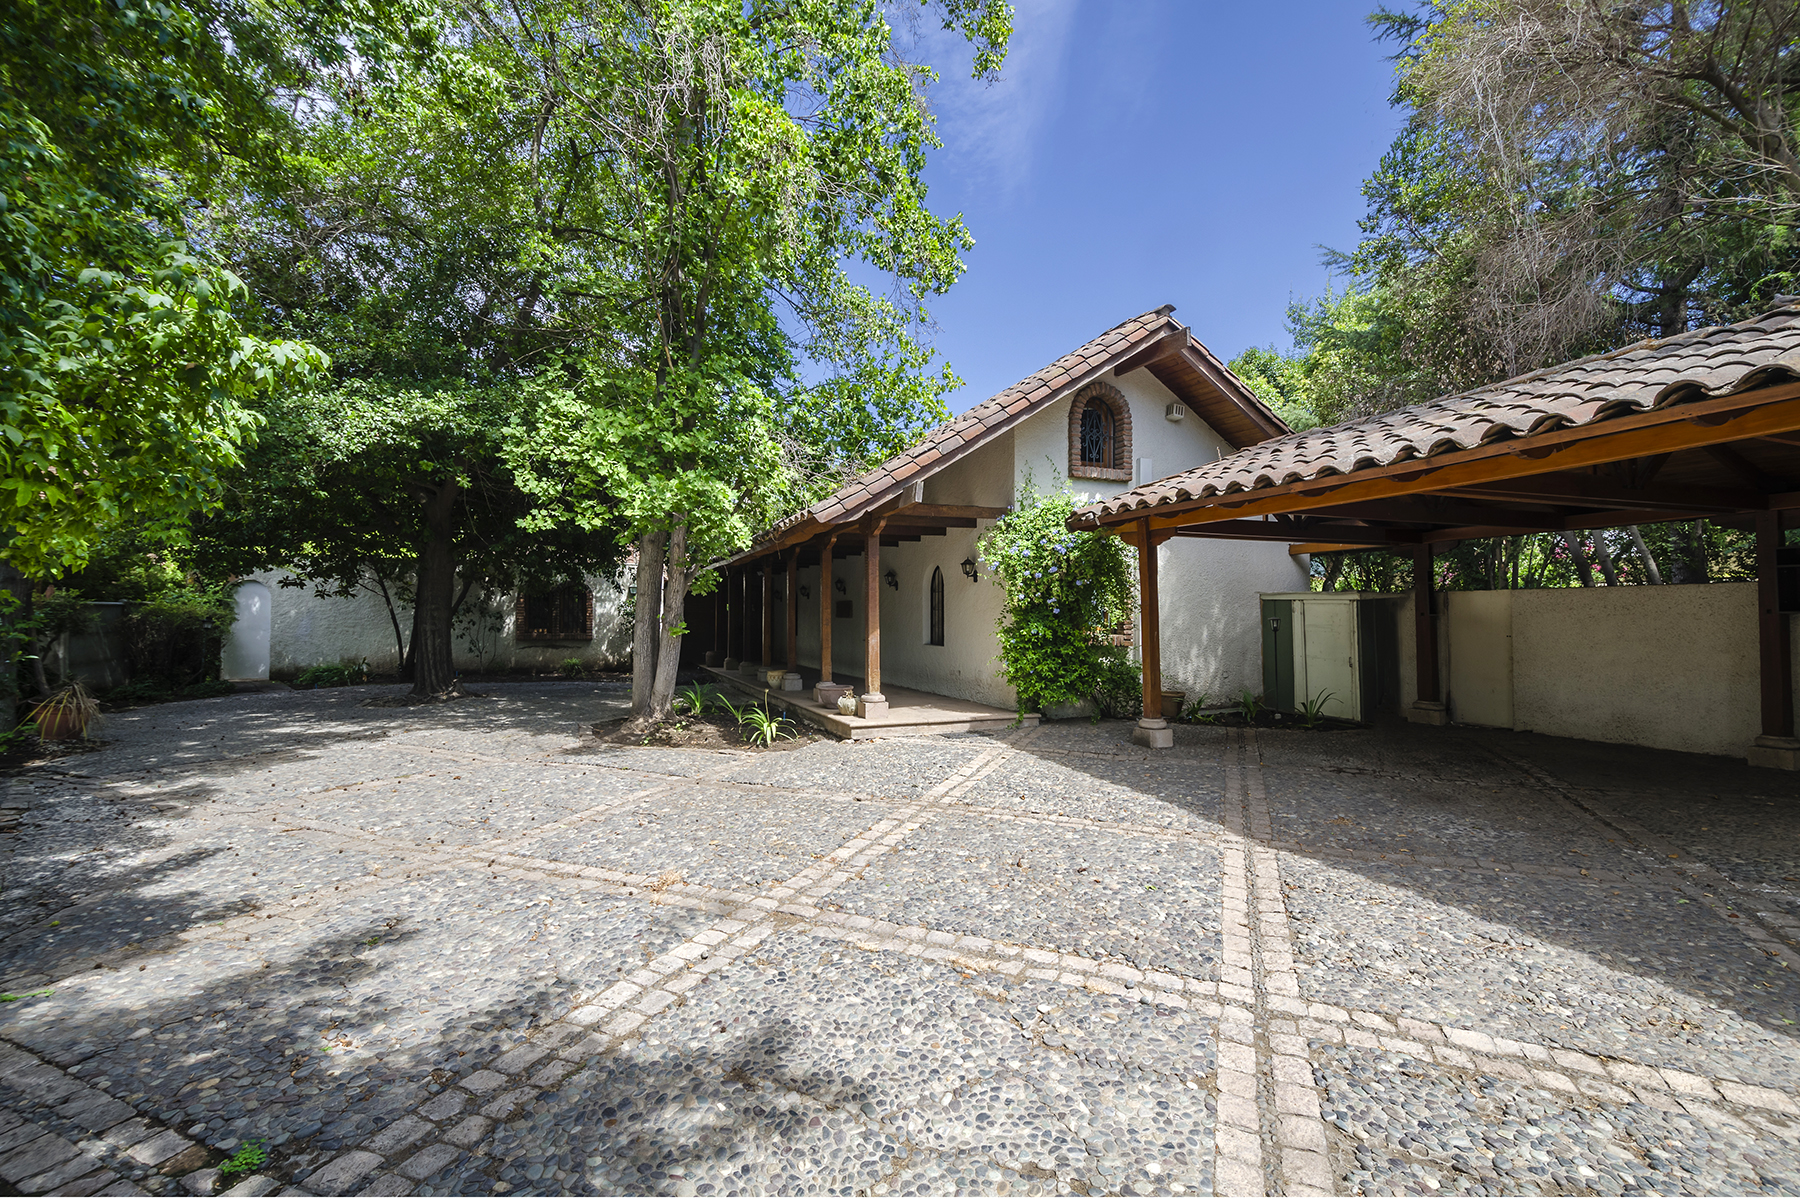 Einfamilienhaus für Verkauf beim Gorgeous Traditional Chilean Home - La Dehesa Lo Barnechea, Santiago, Region Metropolitana De Santiago Chile